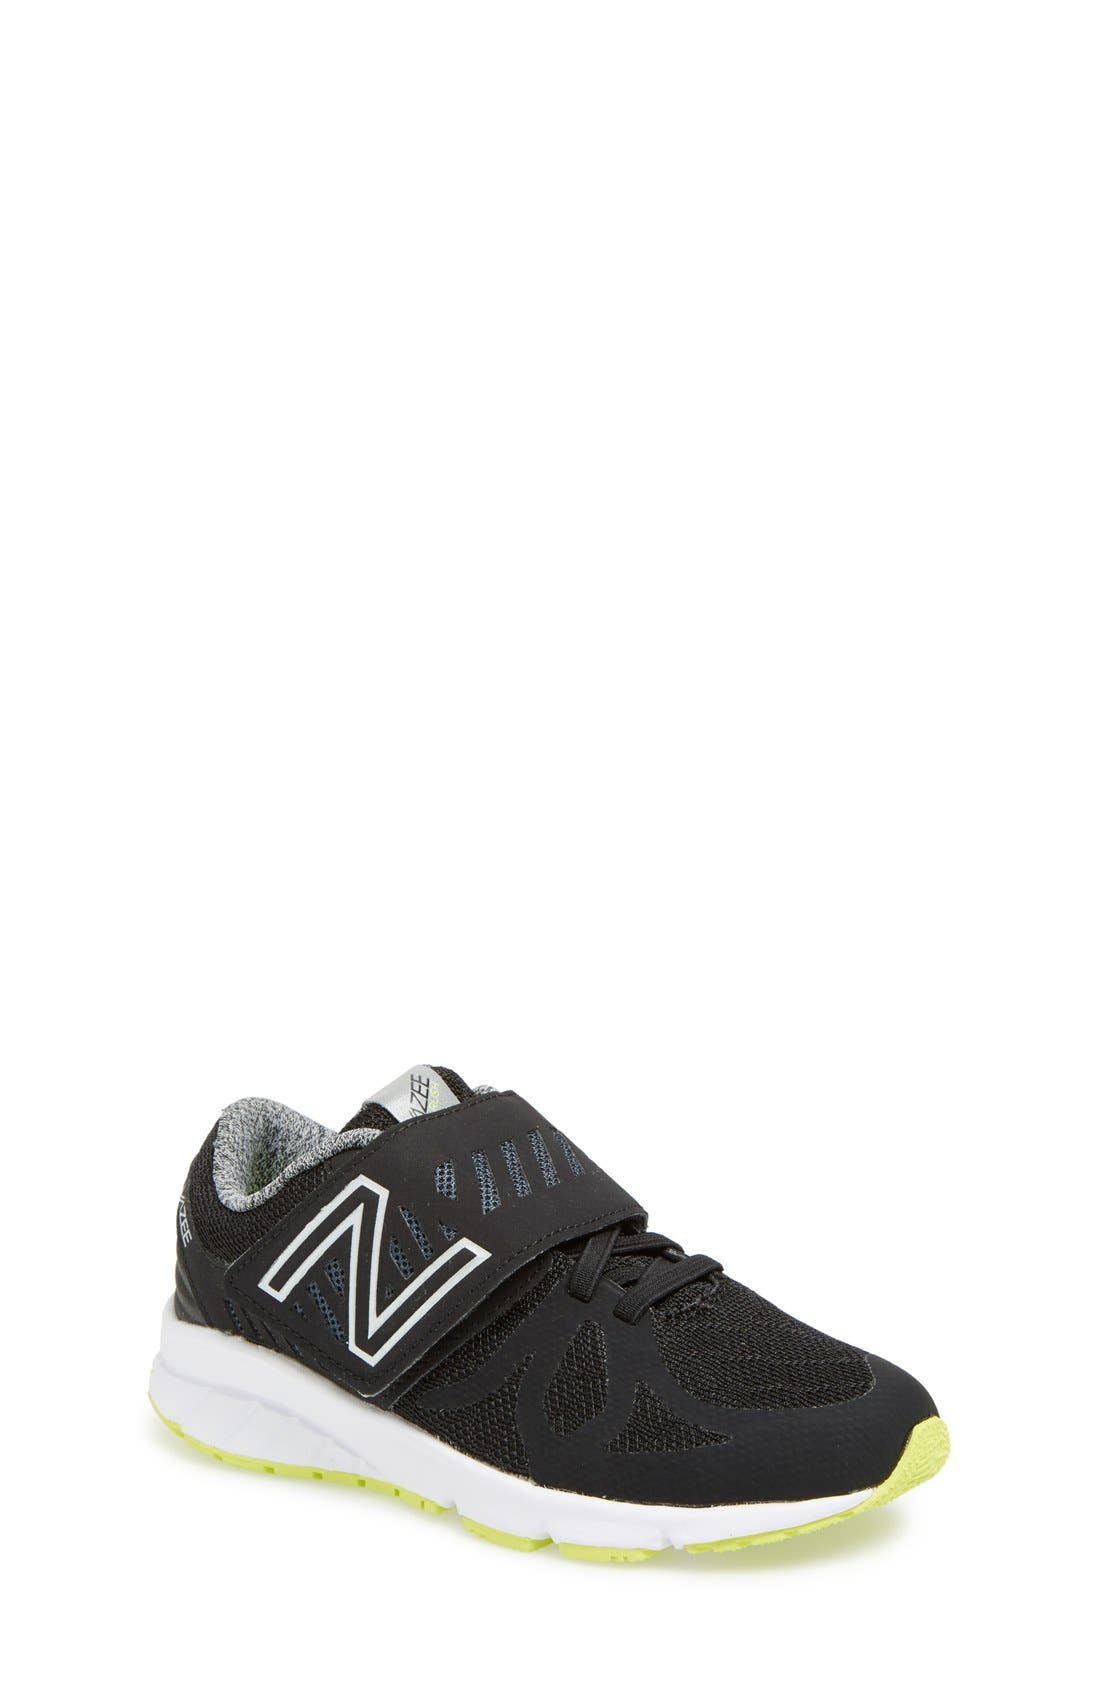 'Vazee Rush 200' Athletic Shoe,                             Main thumbnail 1, color,                             001